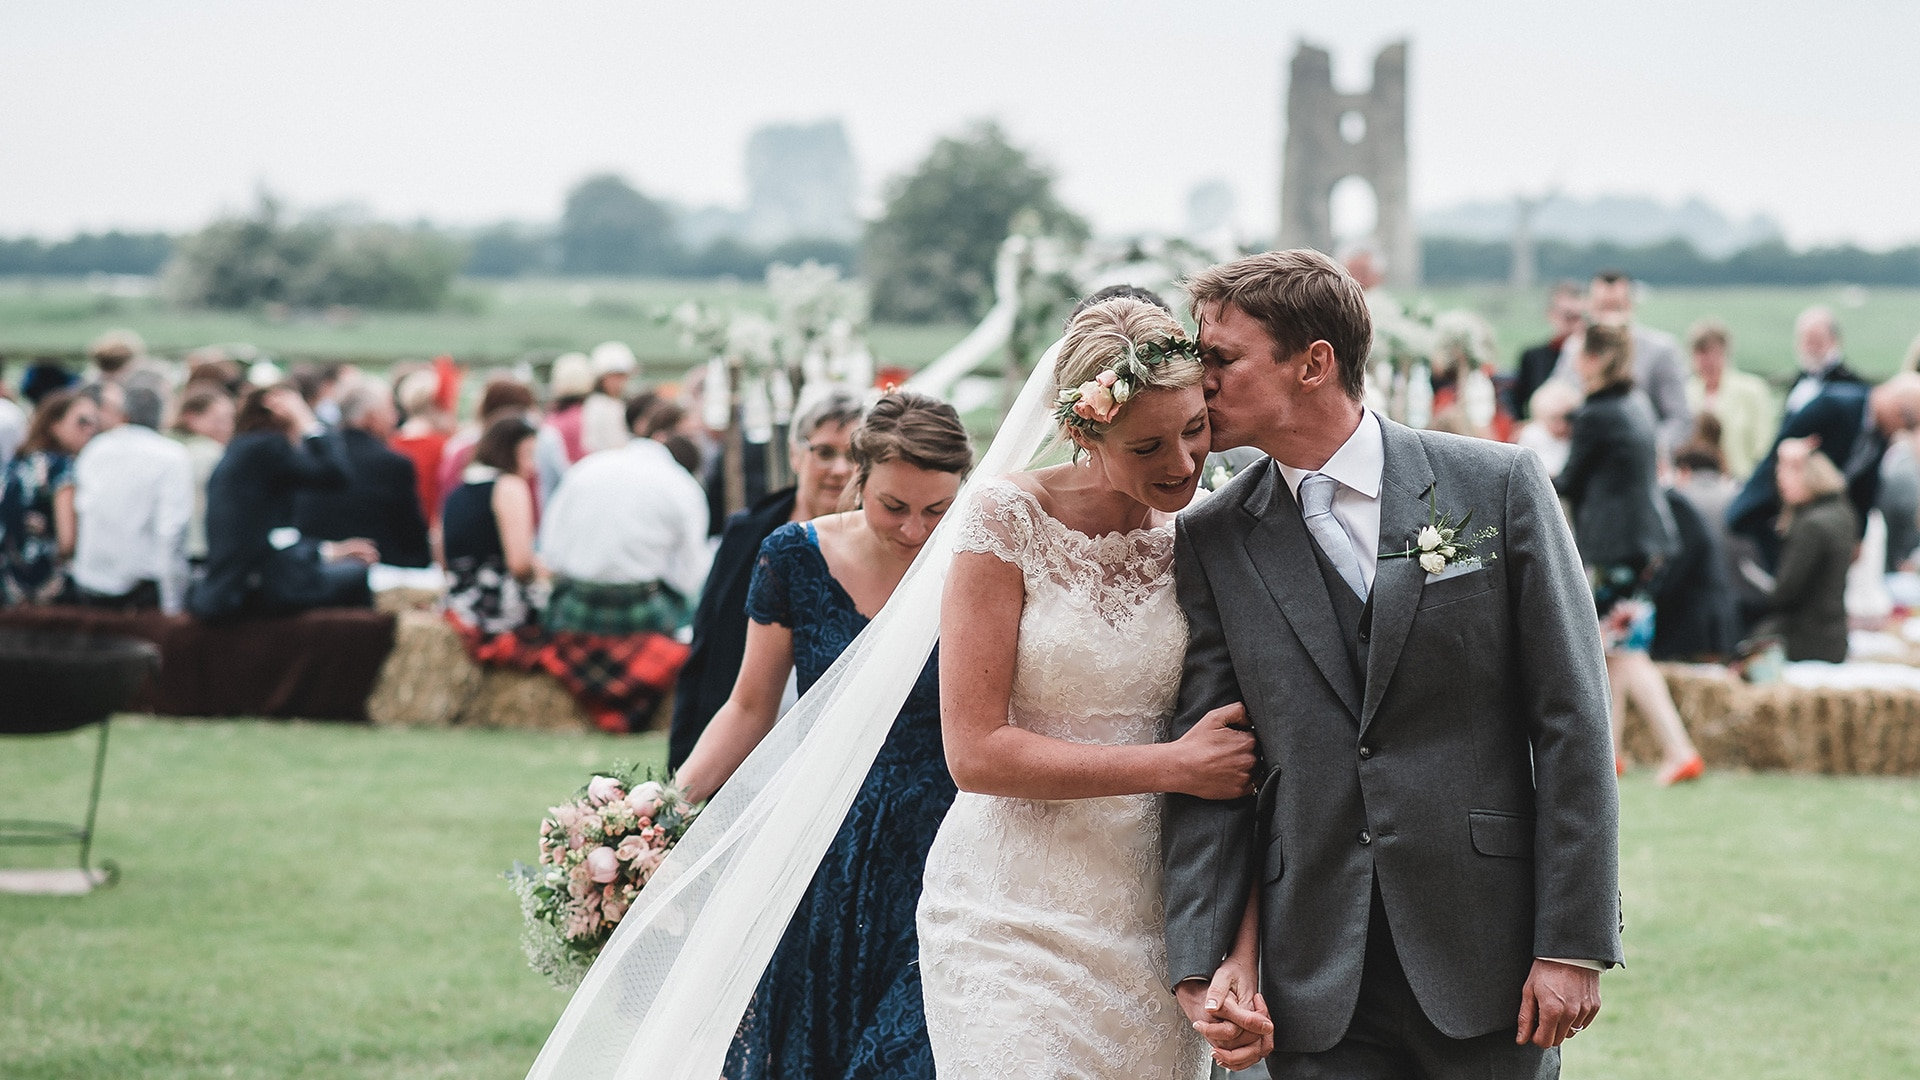 Get-Married-Weddings-at-Godwick-Great-Barn-in-Norfolk